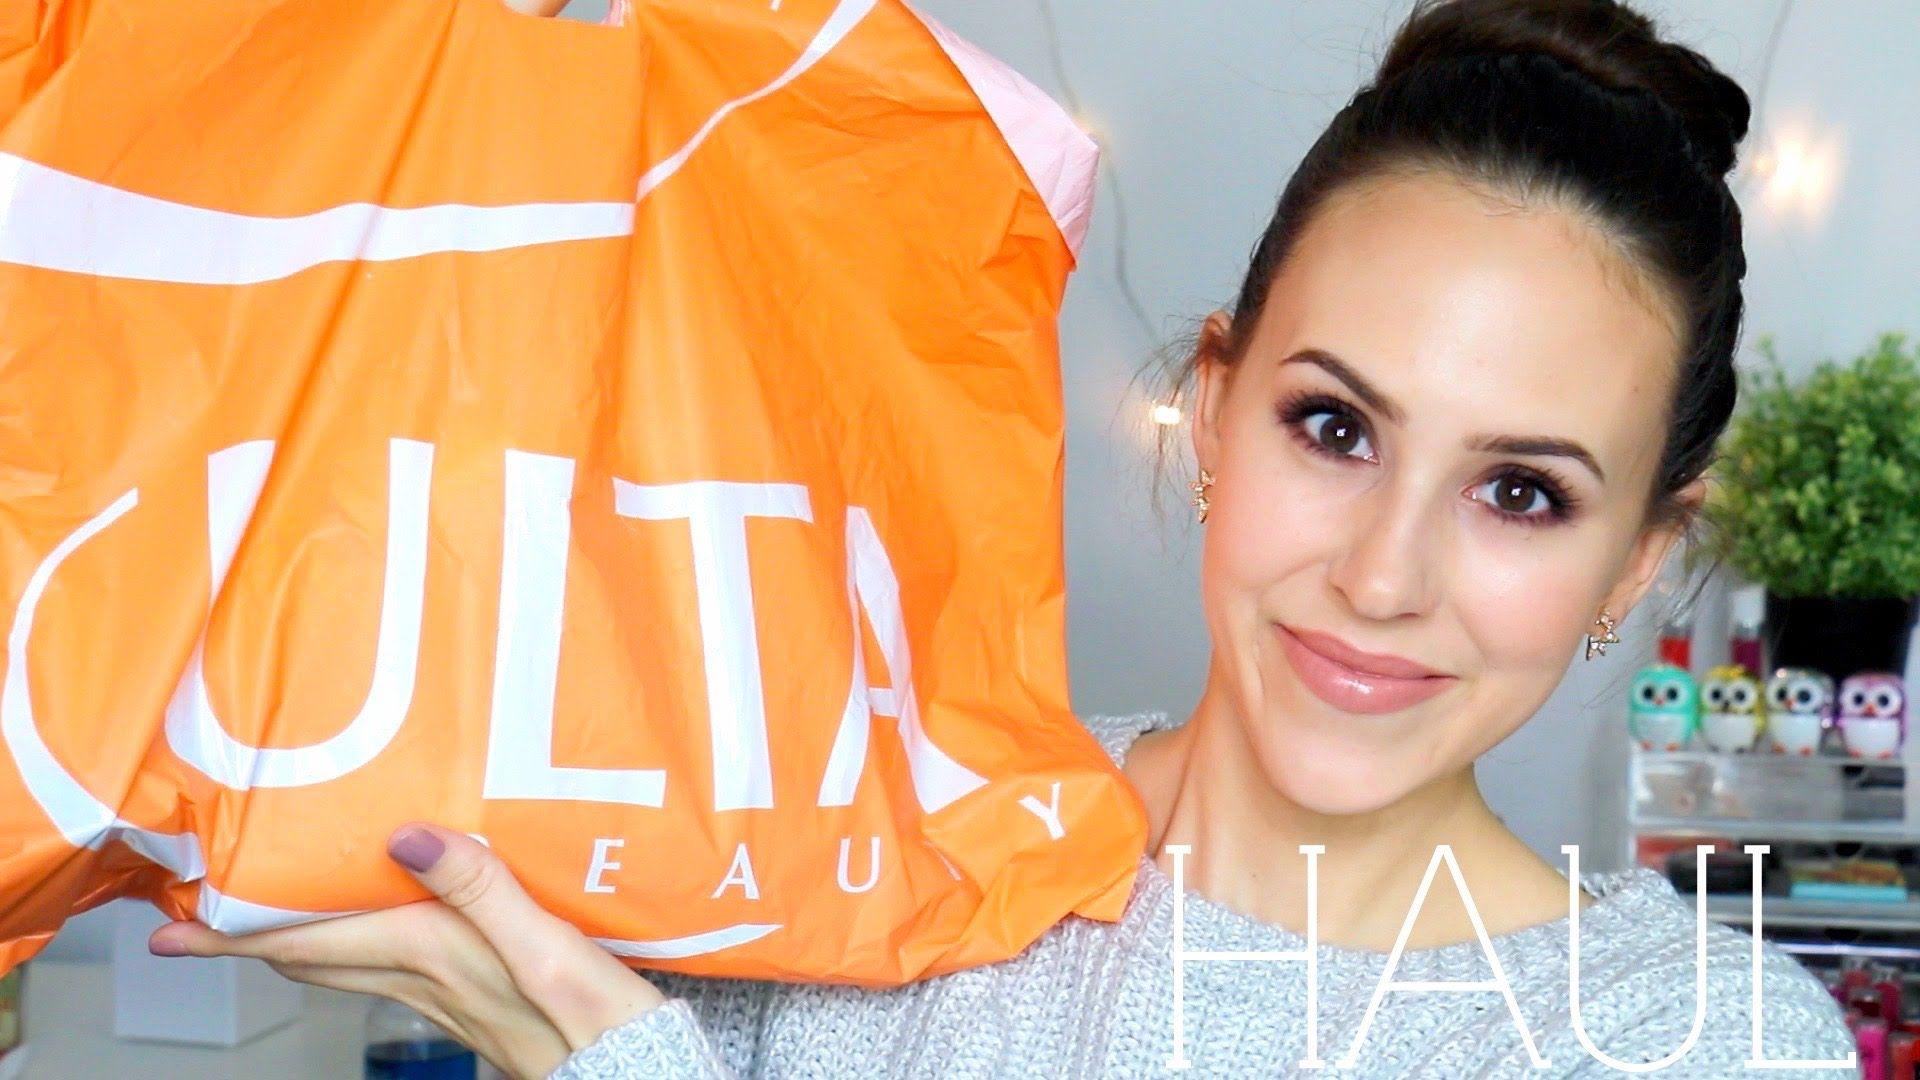 Ulta Haul 2015 Makeup & Beauty Beauty with Emily Fox